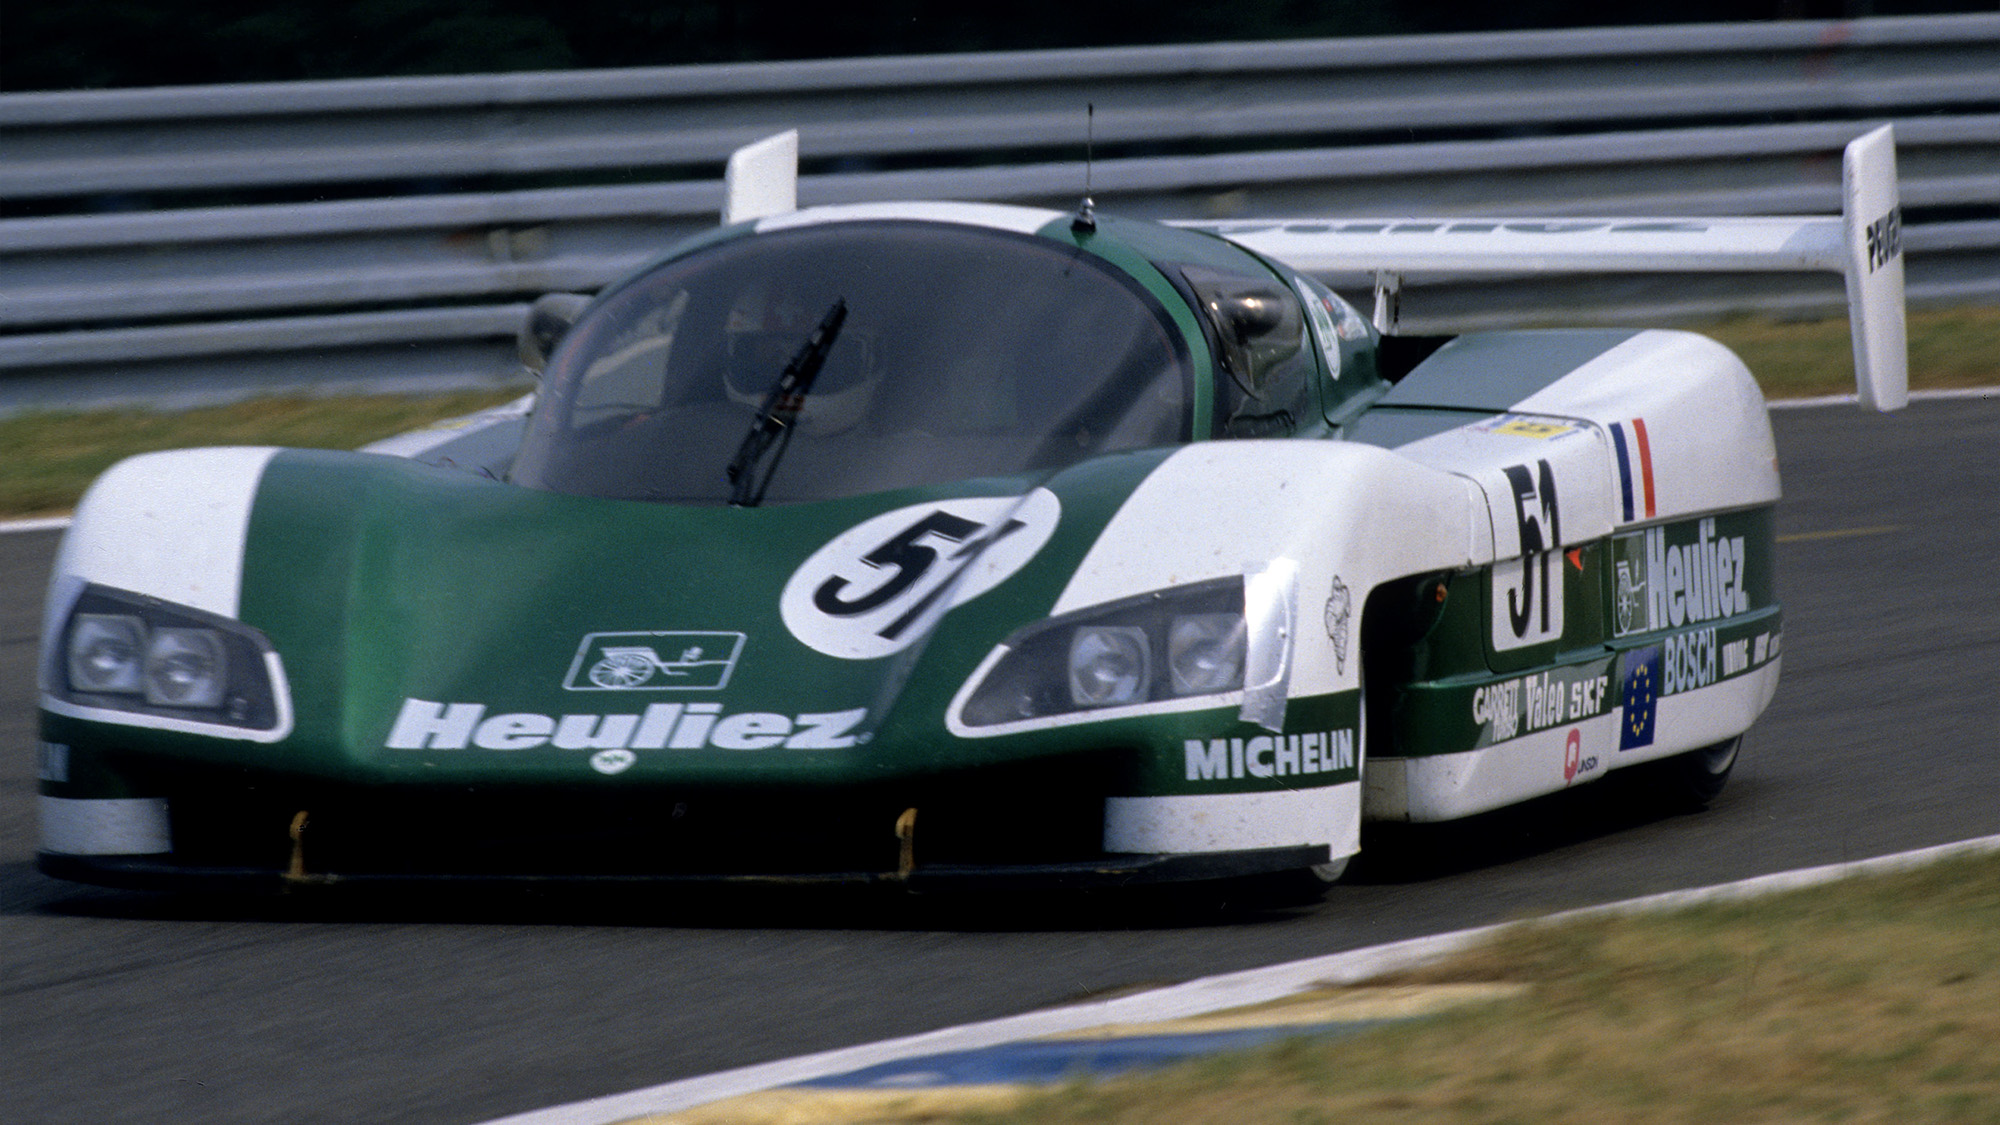 Claude Haldi Roger Dorchy and Jean Daniel Raulet WM P88 in the 1988 Le Mans 24 Hours